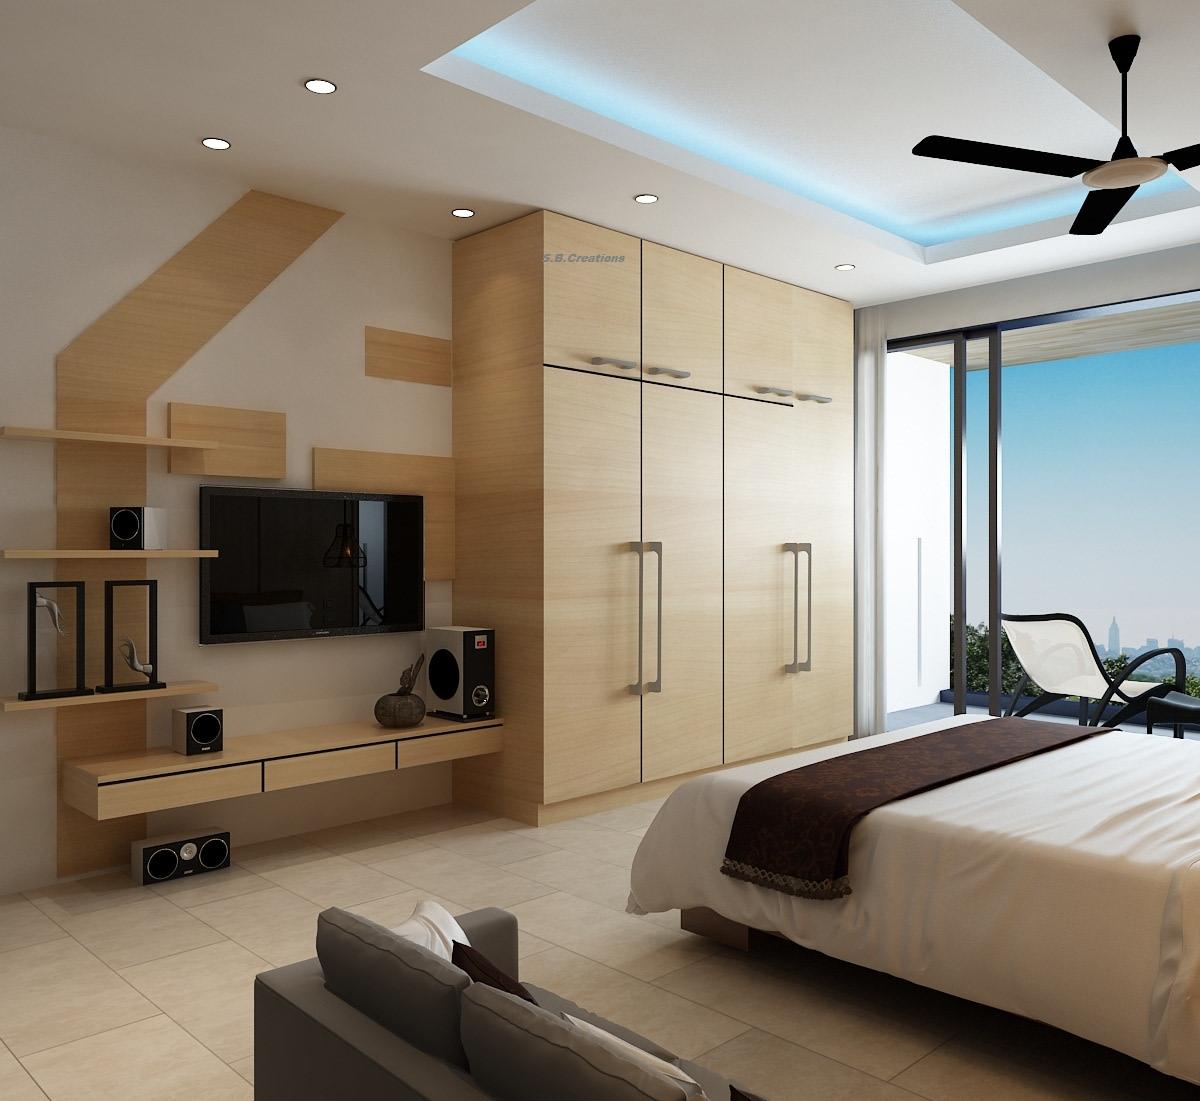 Simple Serenity by Sanjib Sarkar Contemporary | Interior Design Photos & Ideas